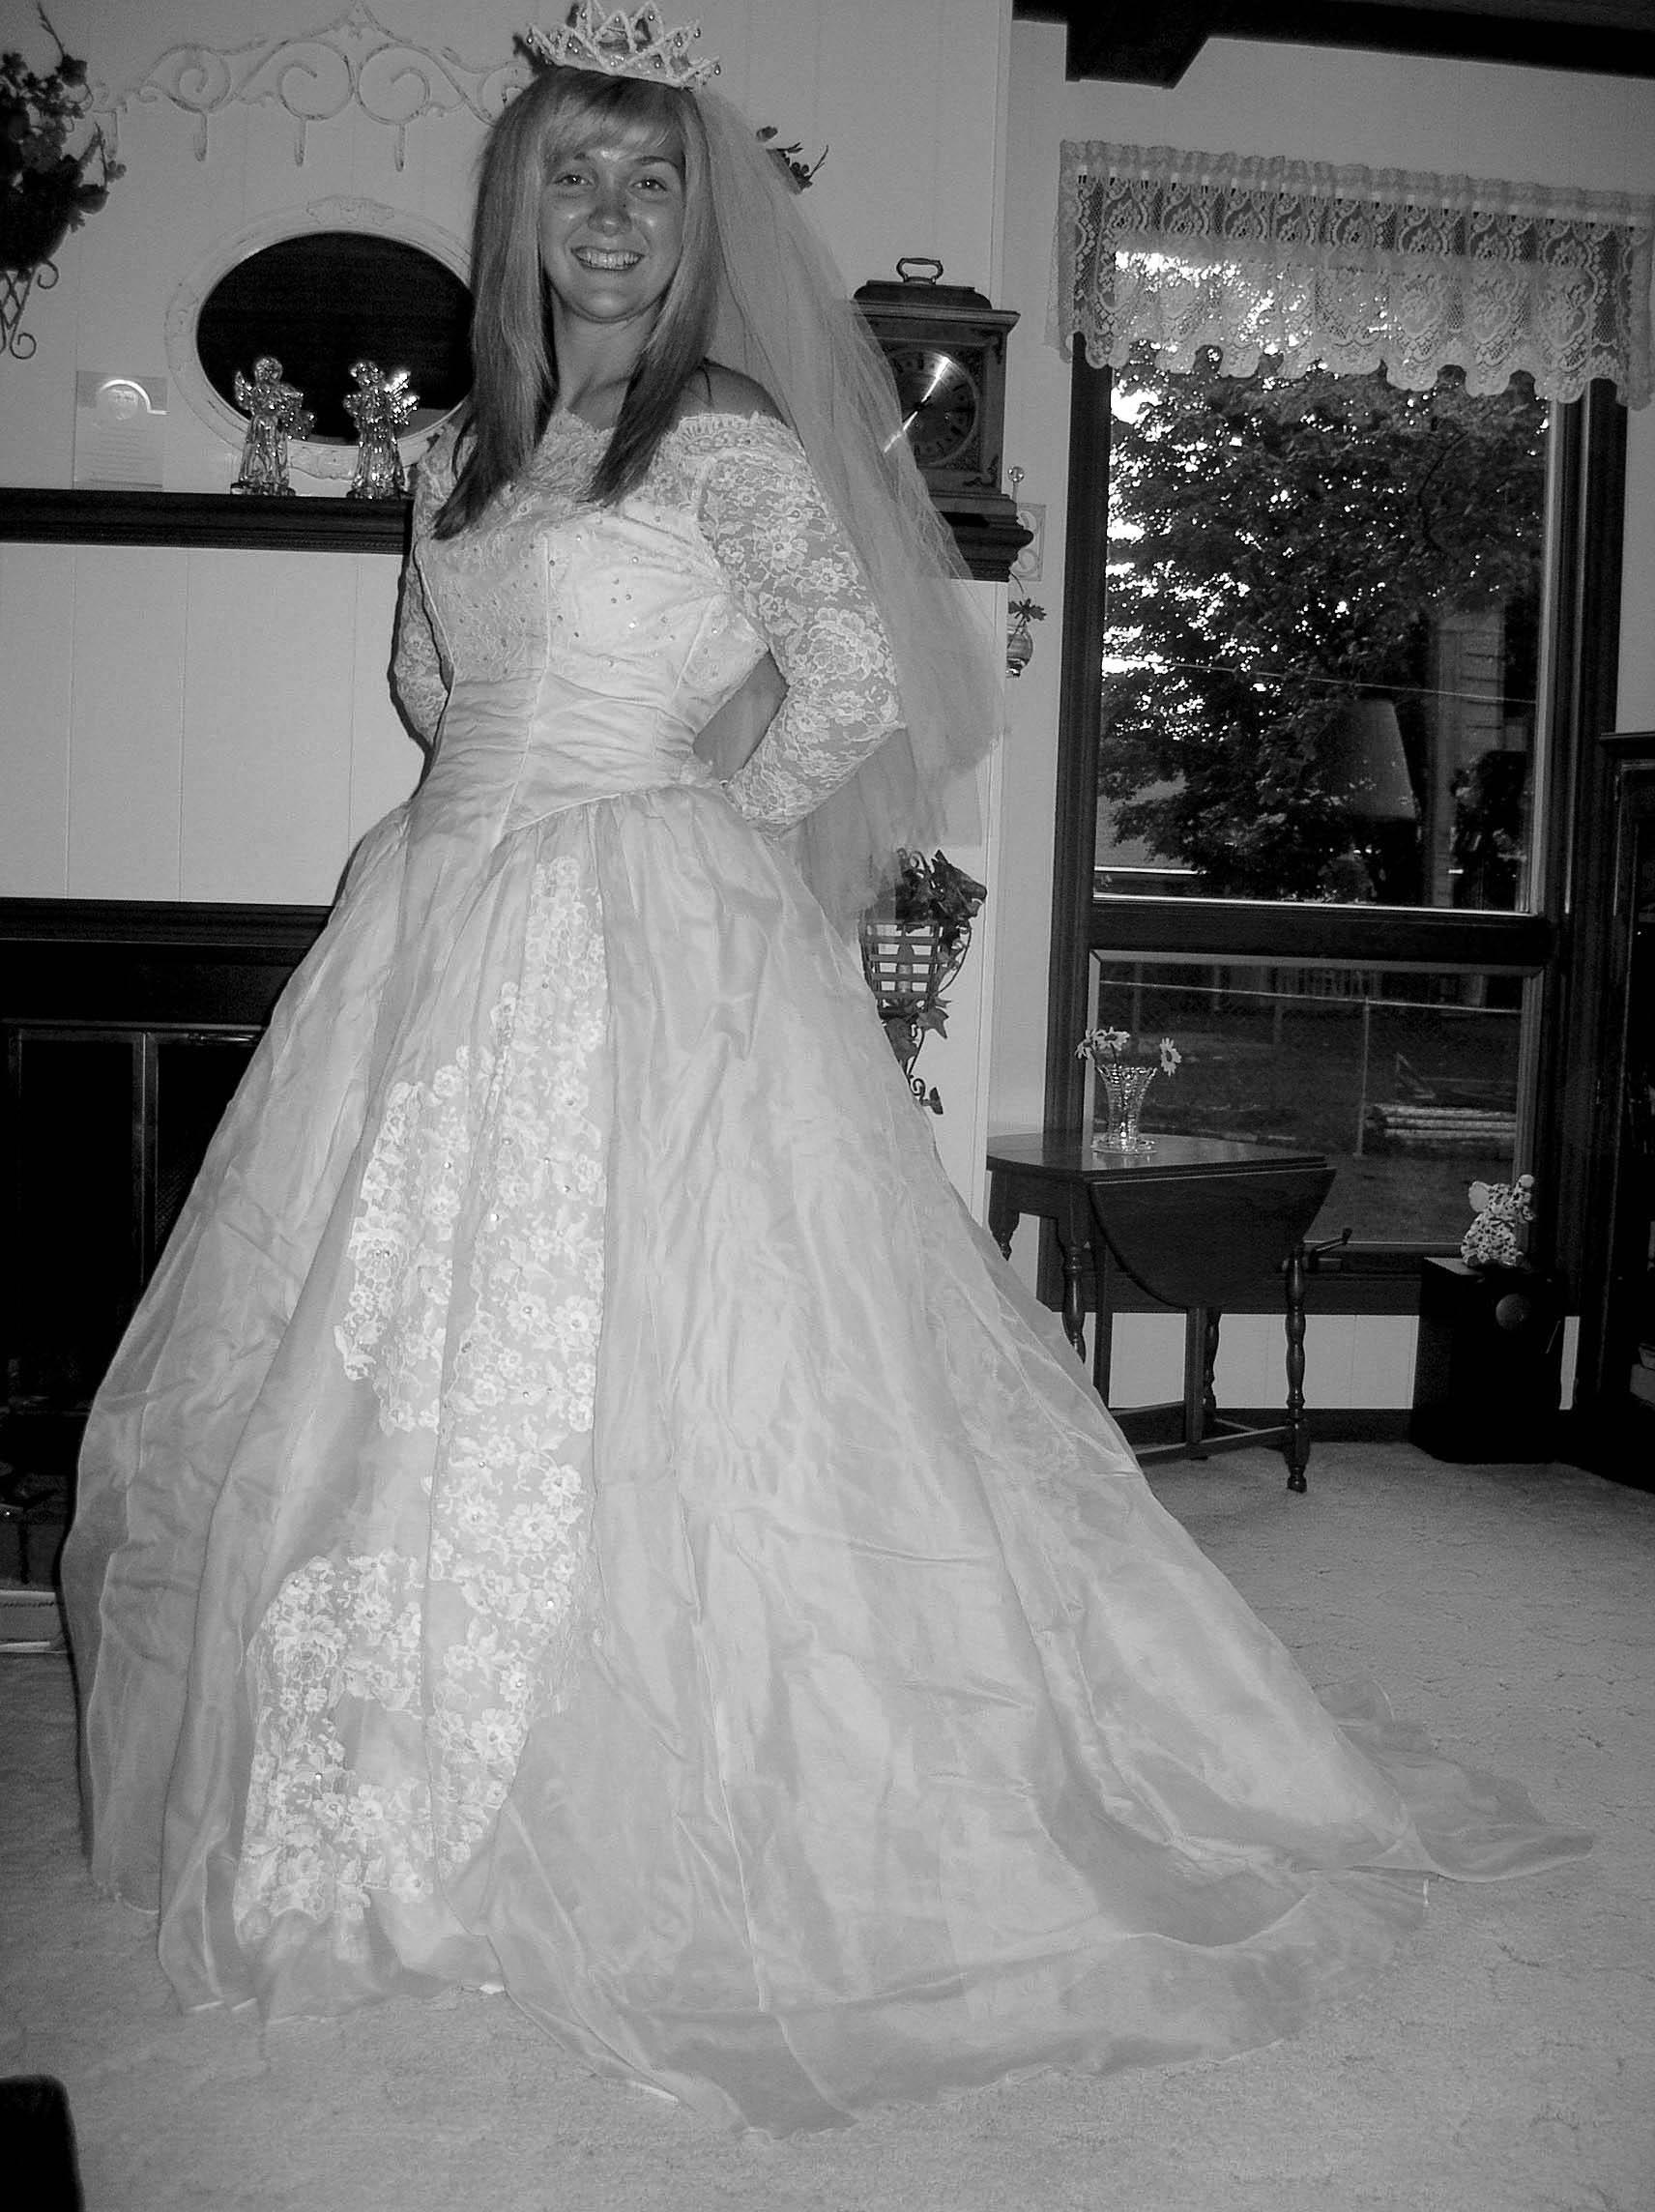 Wedding Dresses For Moms